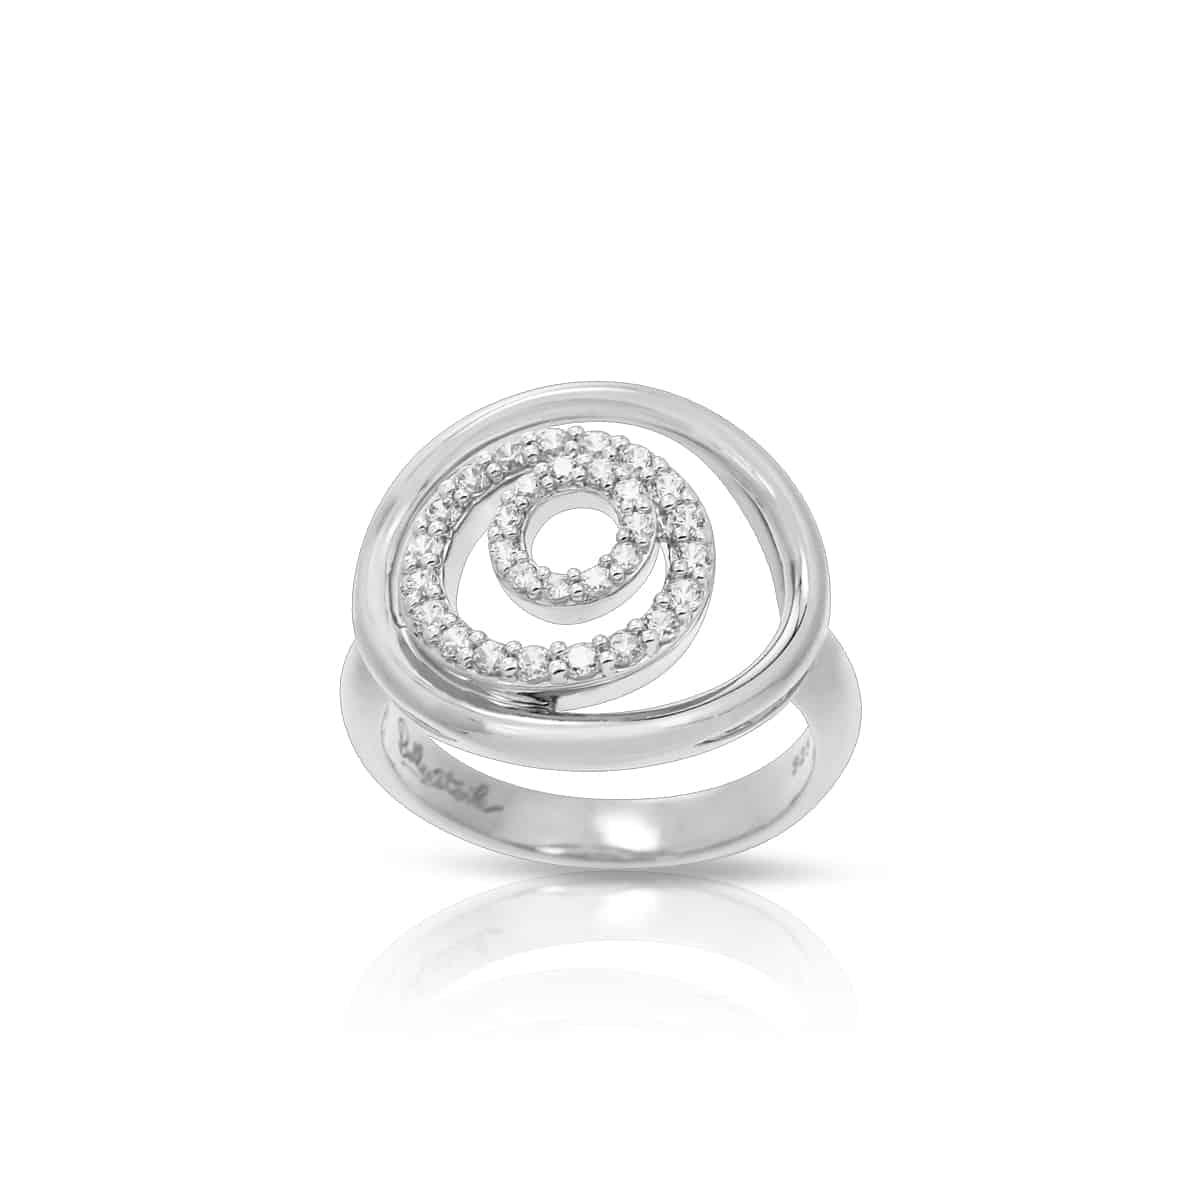 Belle Étoile Concentra White Ring